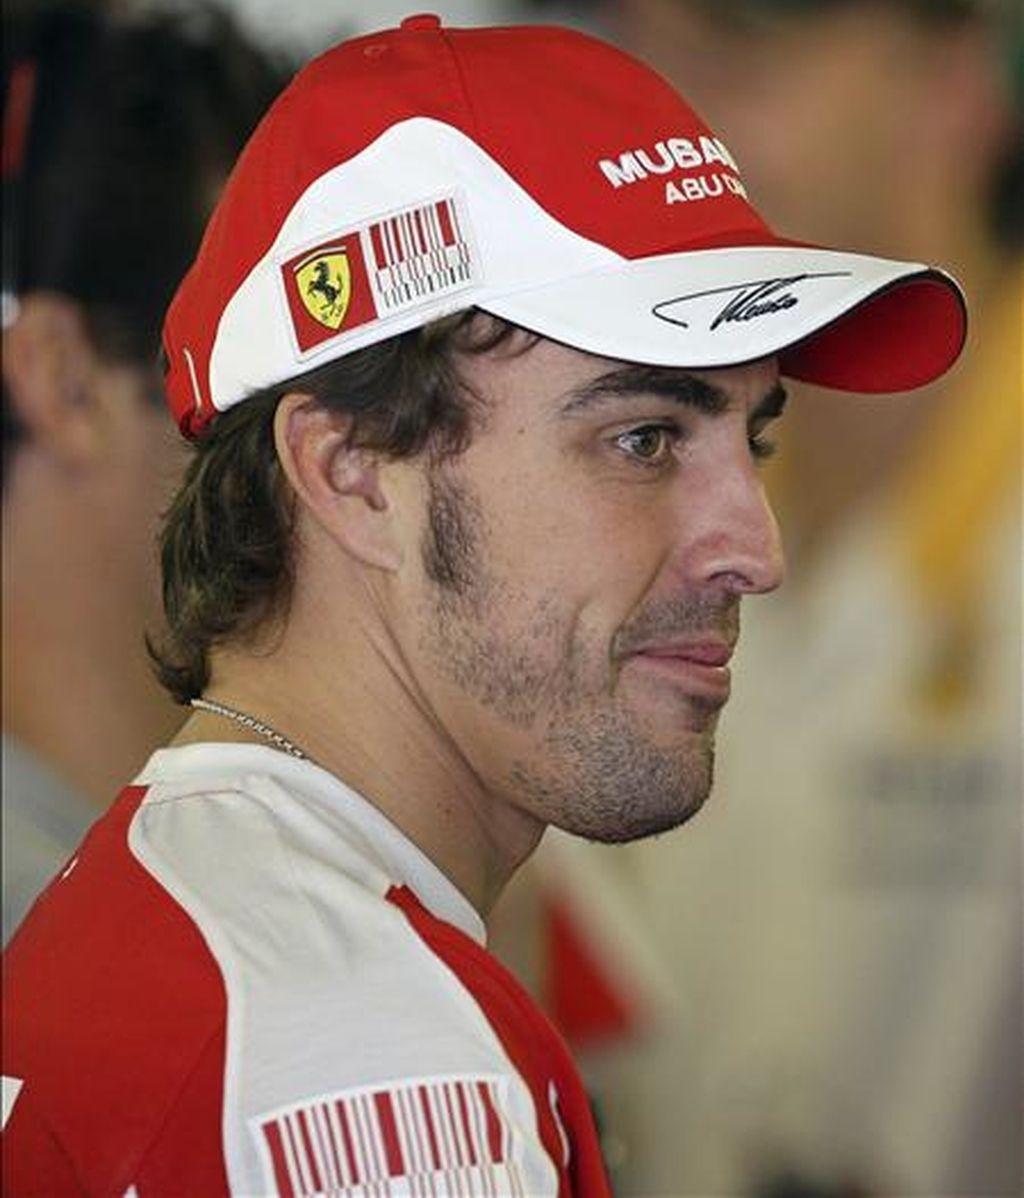 El piloto español de Ferrari, Fernando Alonso. EFE/Archivo